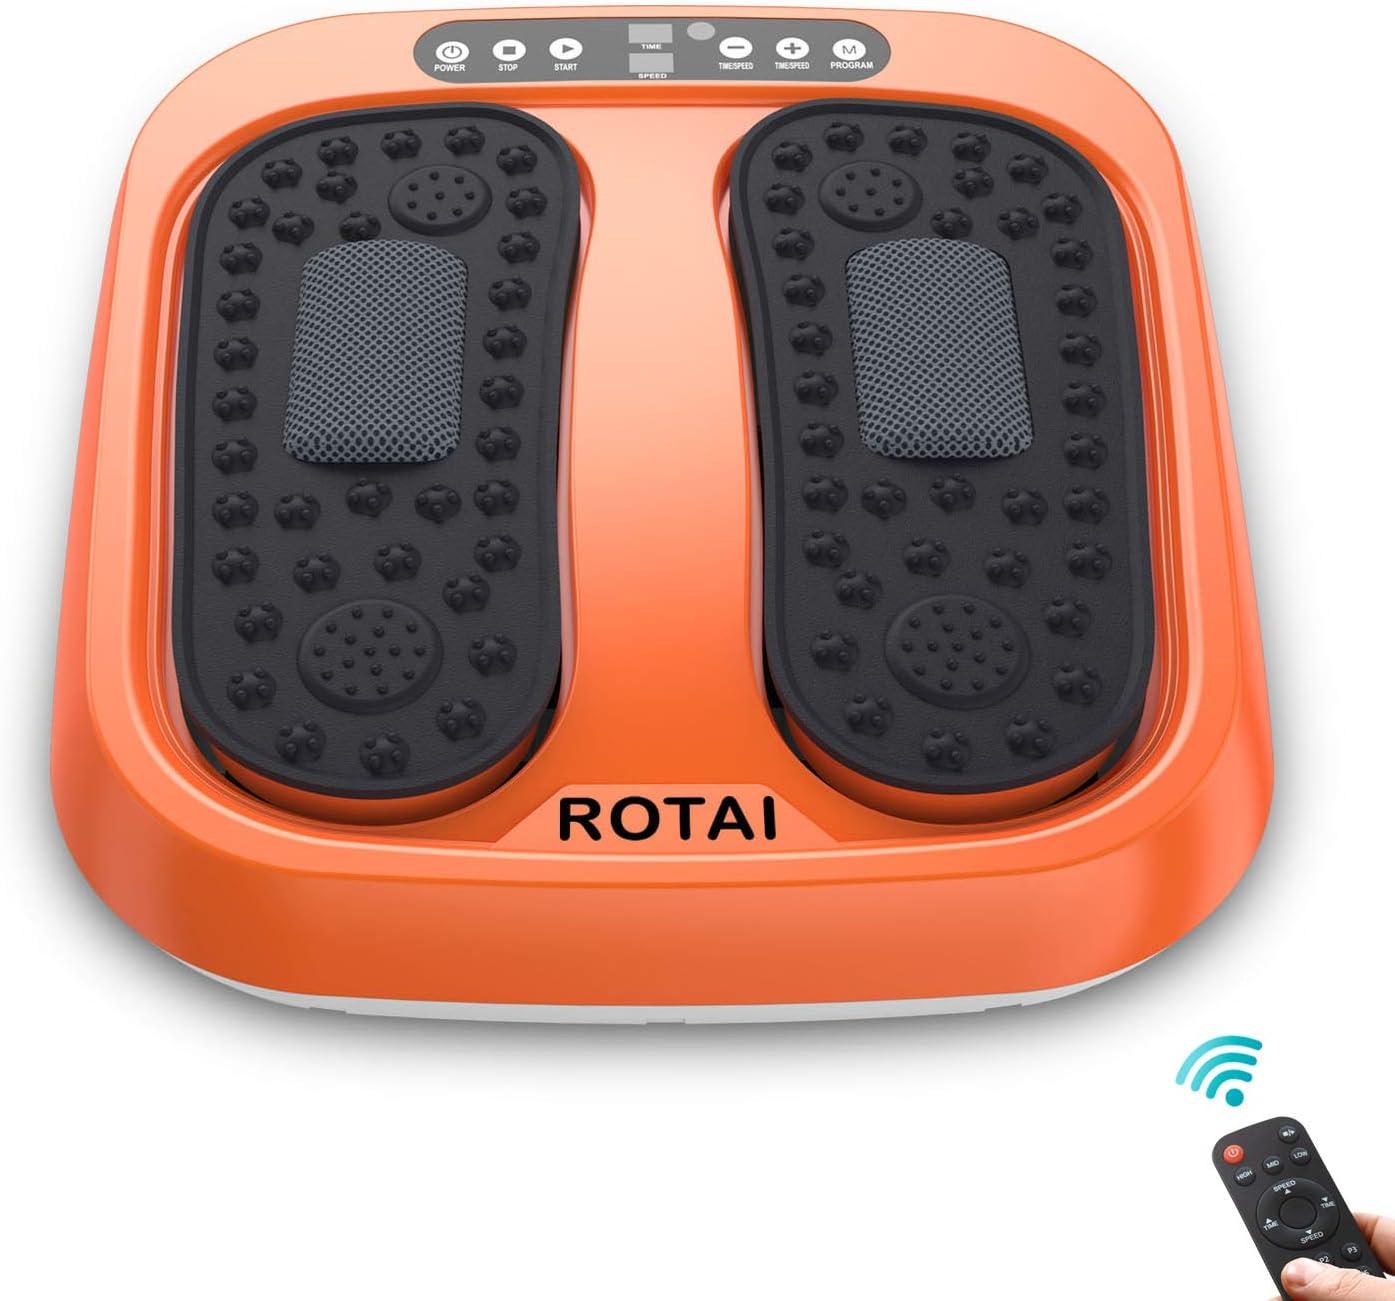 ROTAI Shiatsu Vibration Rotating Acupressure Foot Massager  $70  Coupon